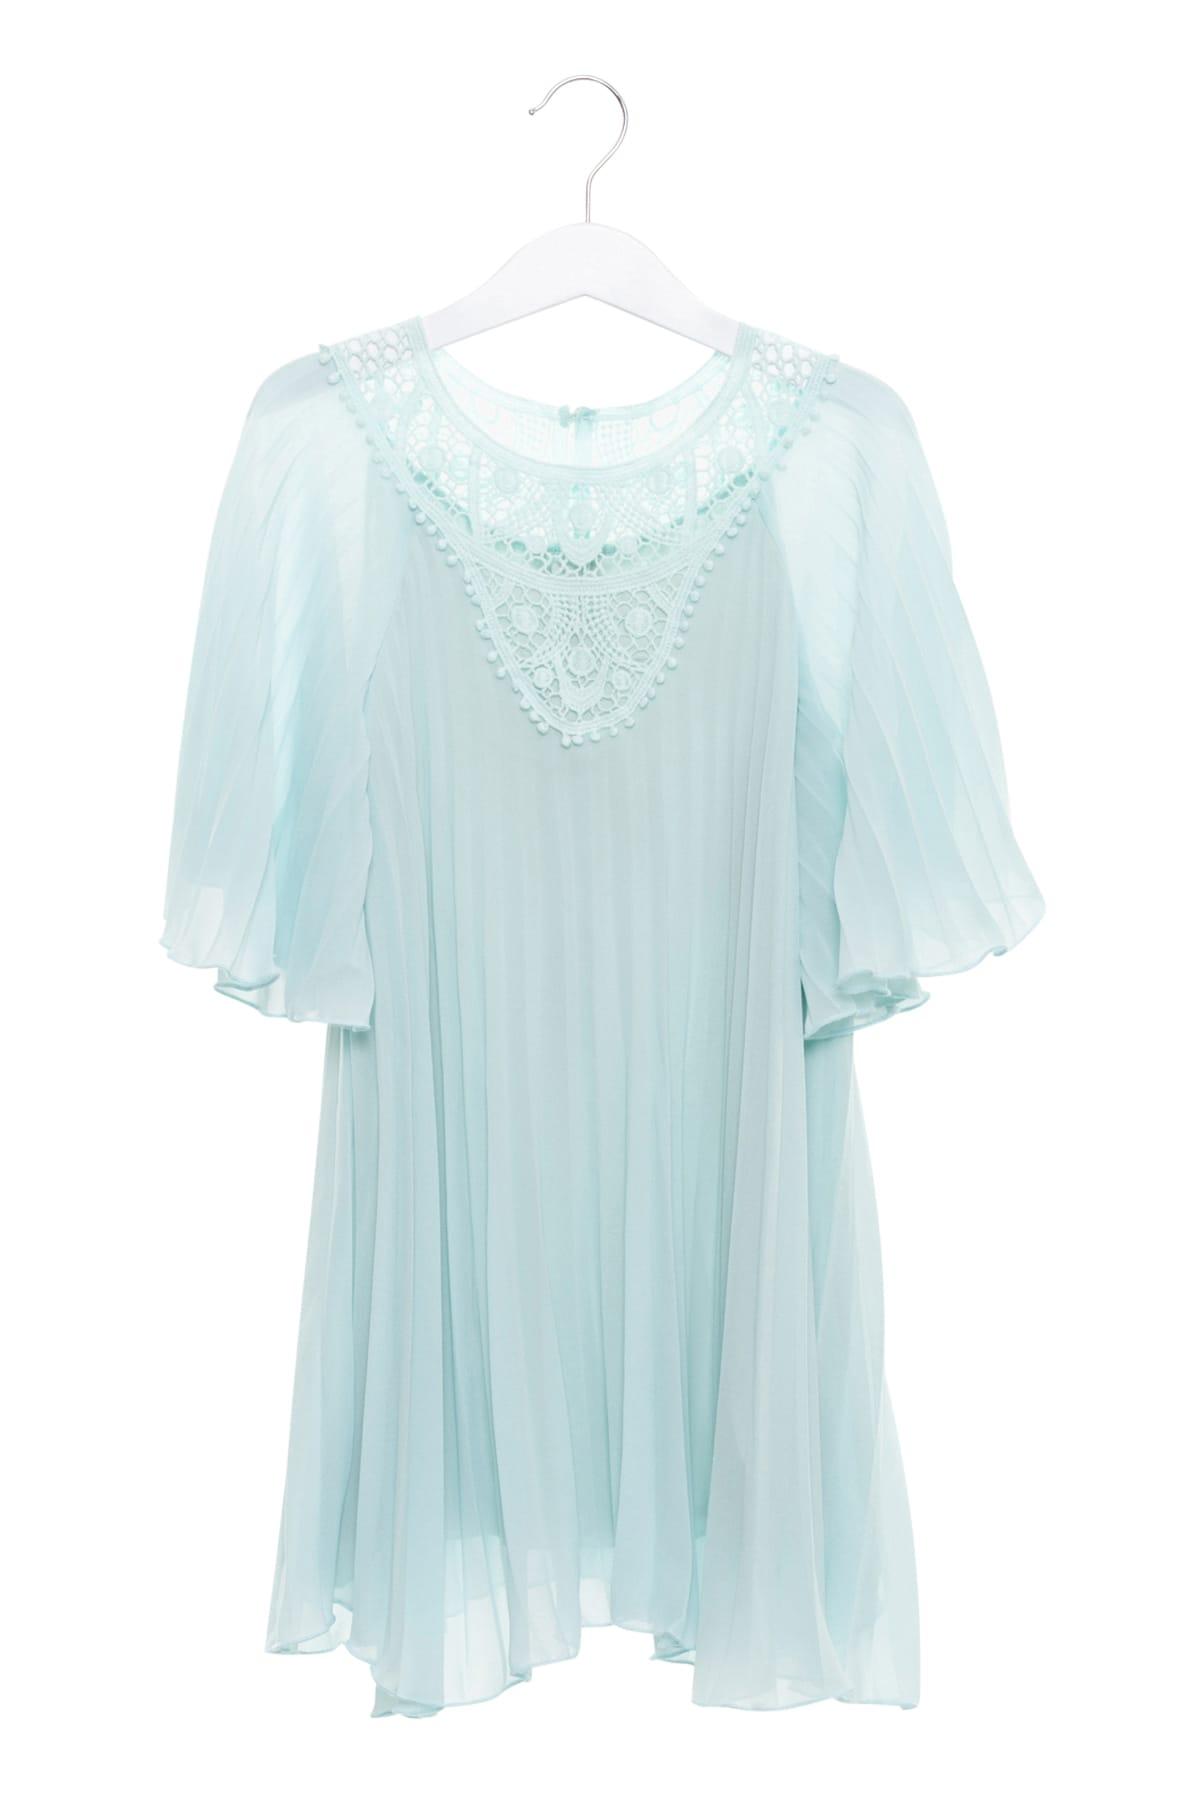 Chloé Plissé Dress